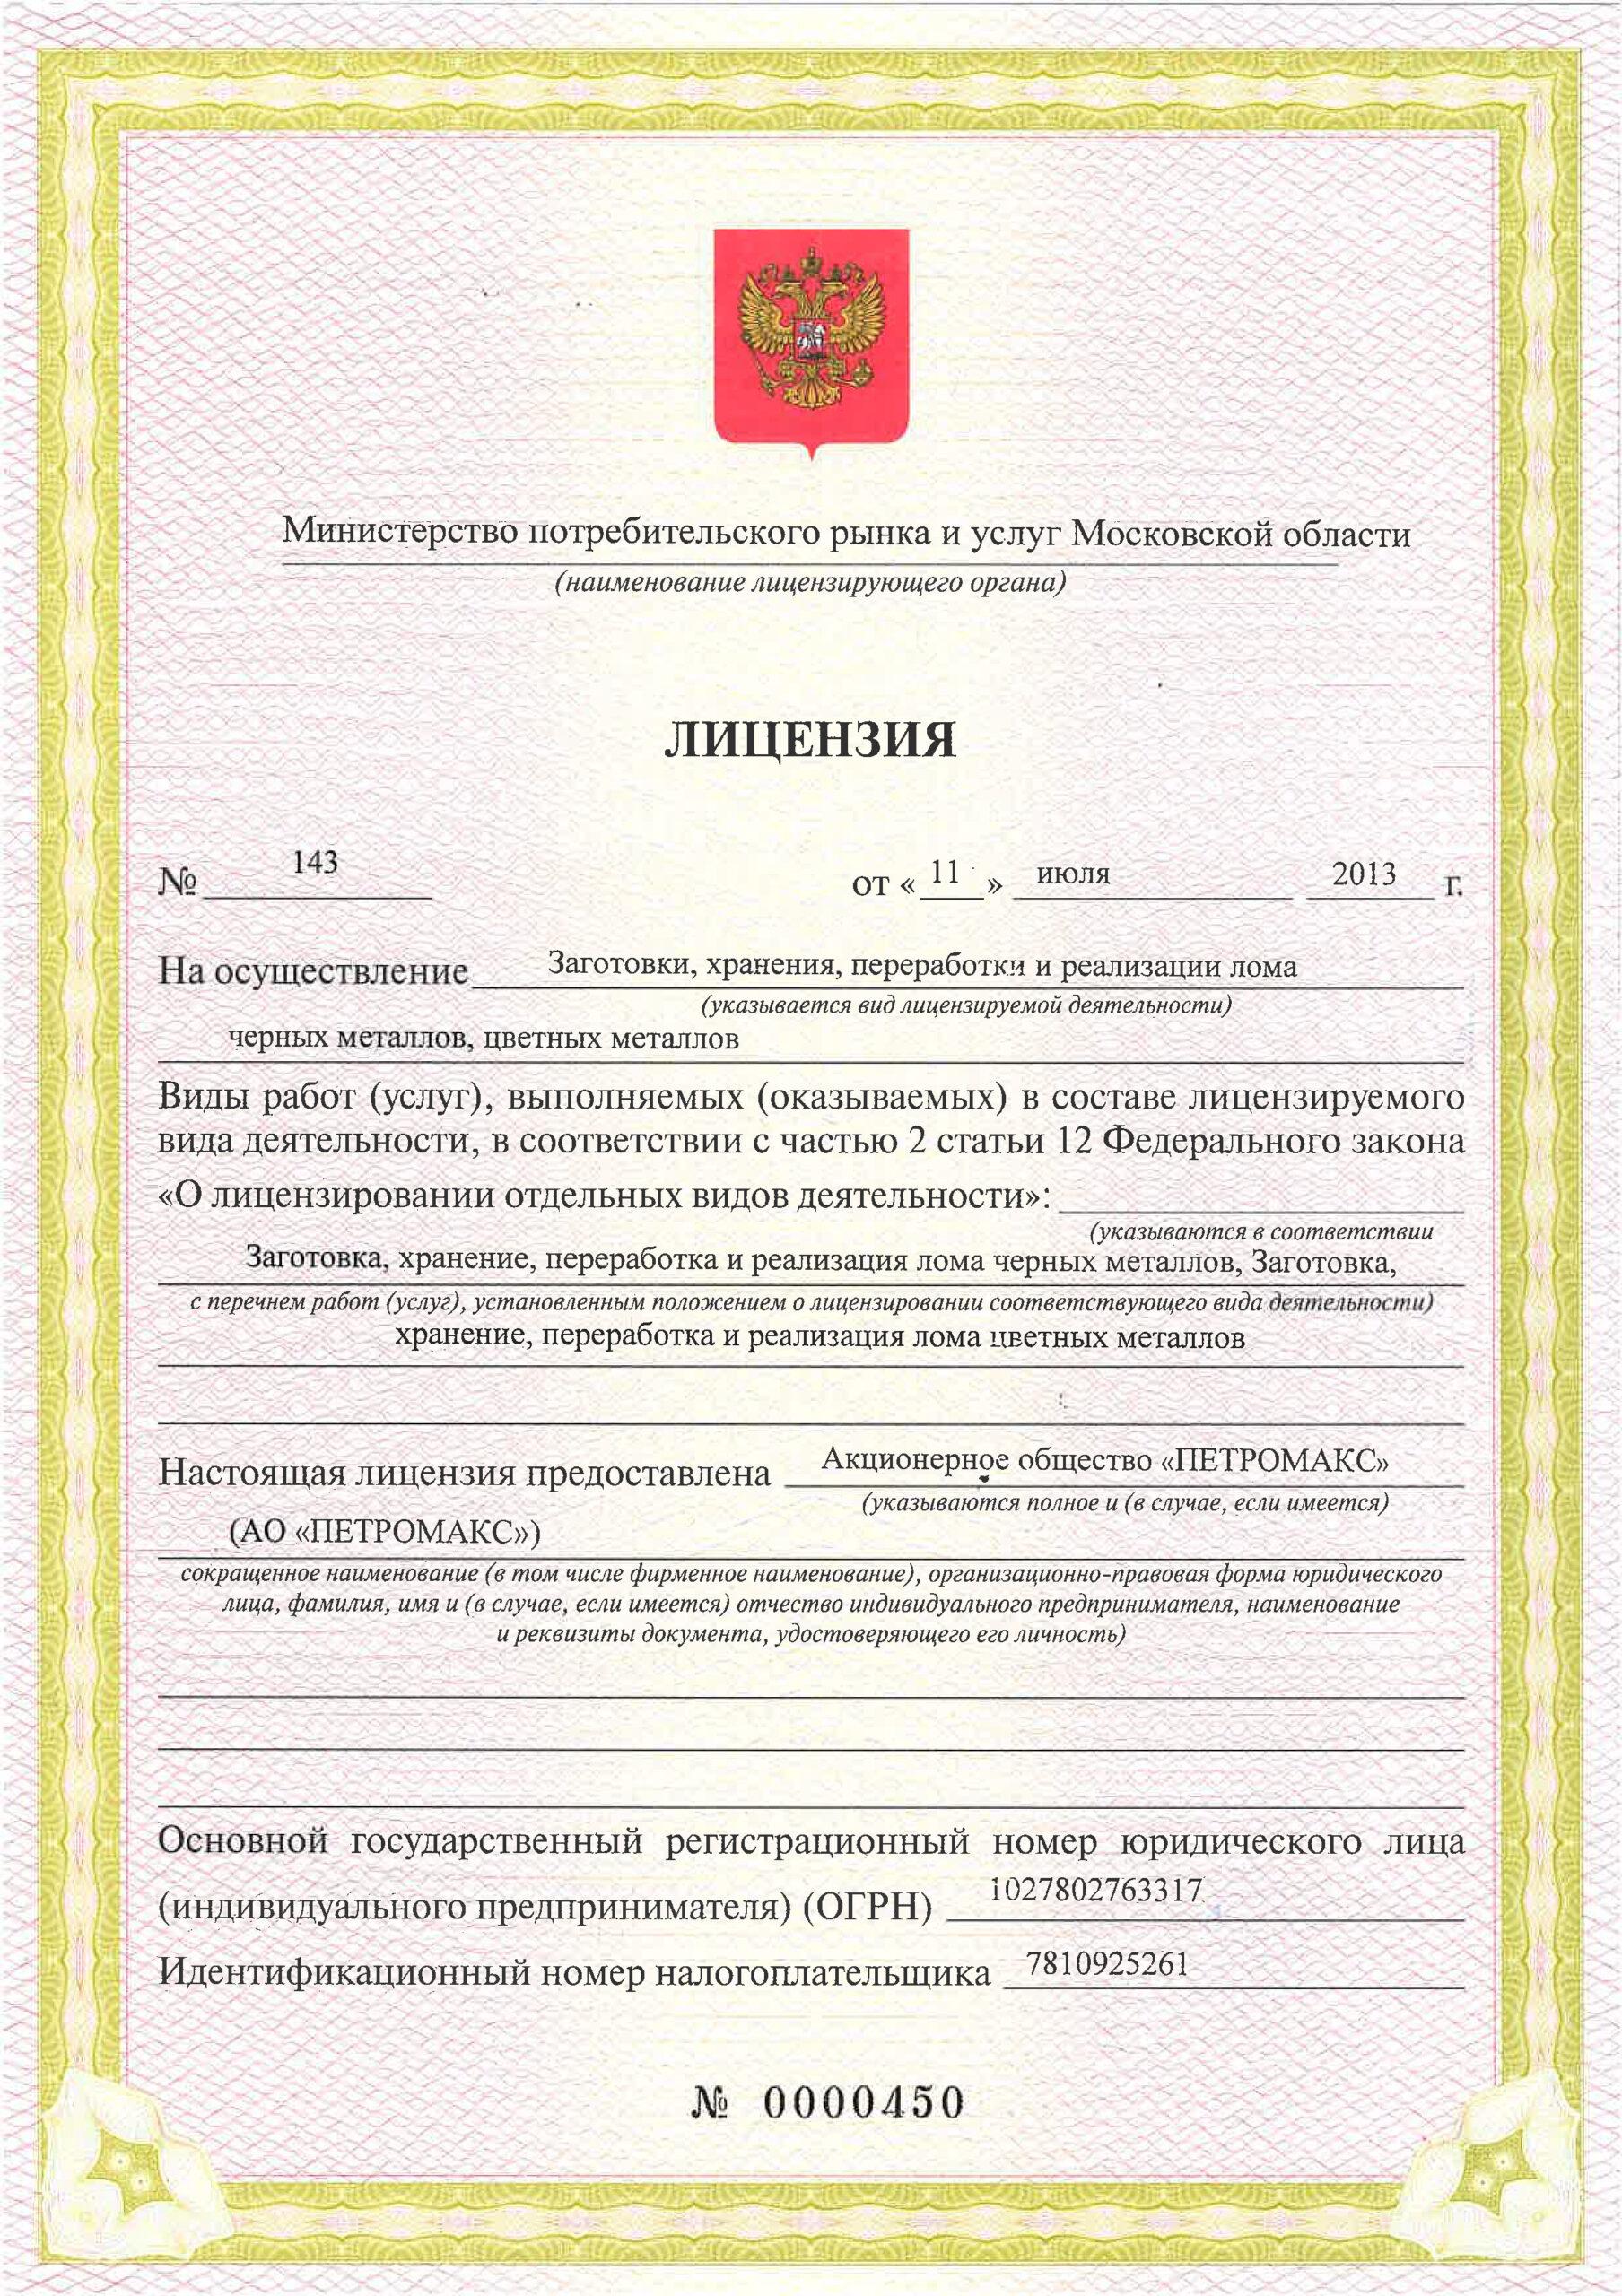 liczenziya-%e2%84%96-143-ot-11-07-2013_lom-1